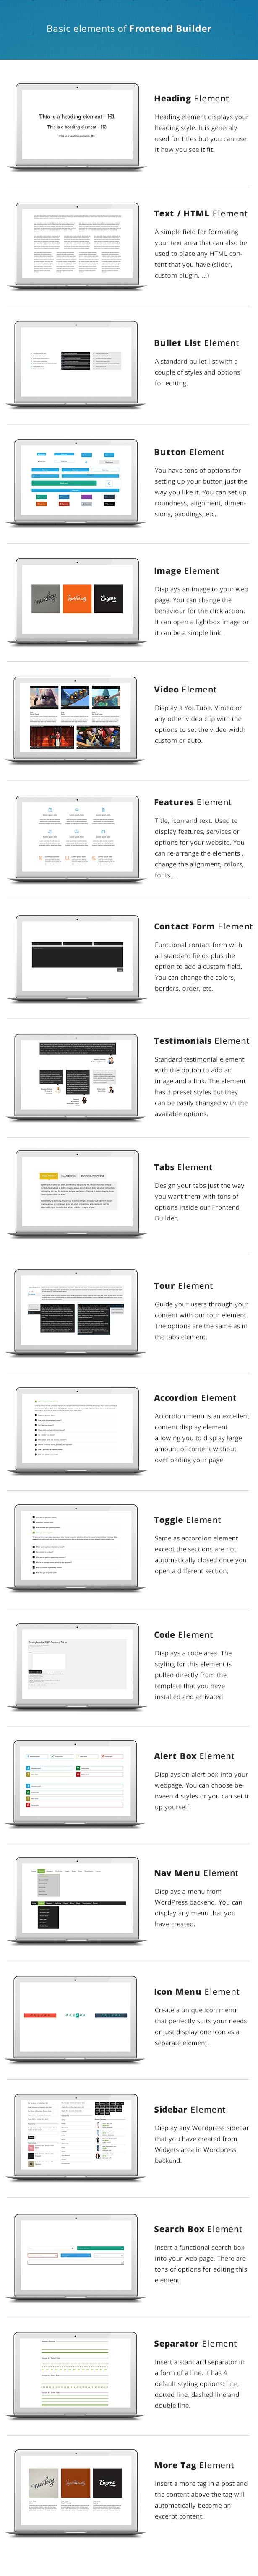 Frontend Builder - WordPress Content Assembler, Page Builder & Drag & Drop Page Composer - 5